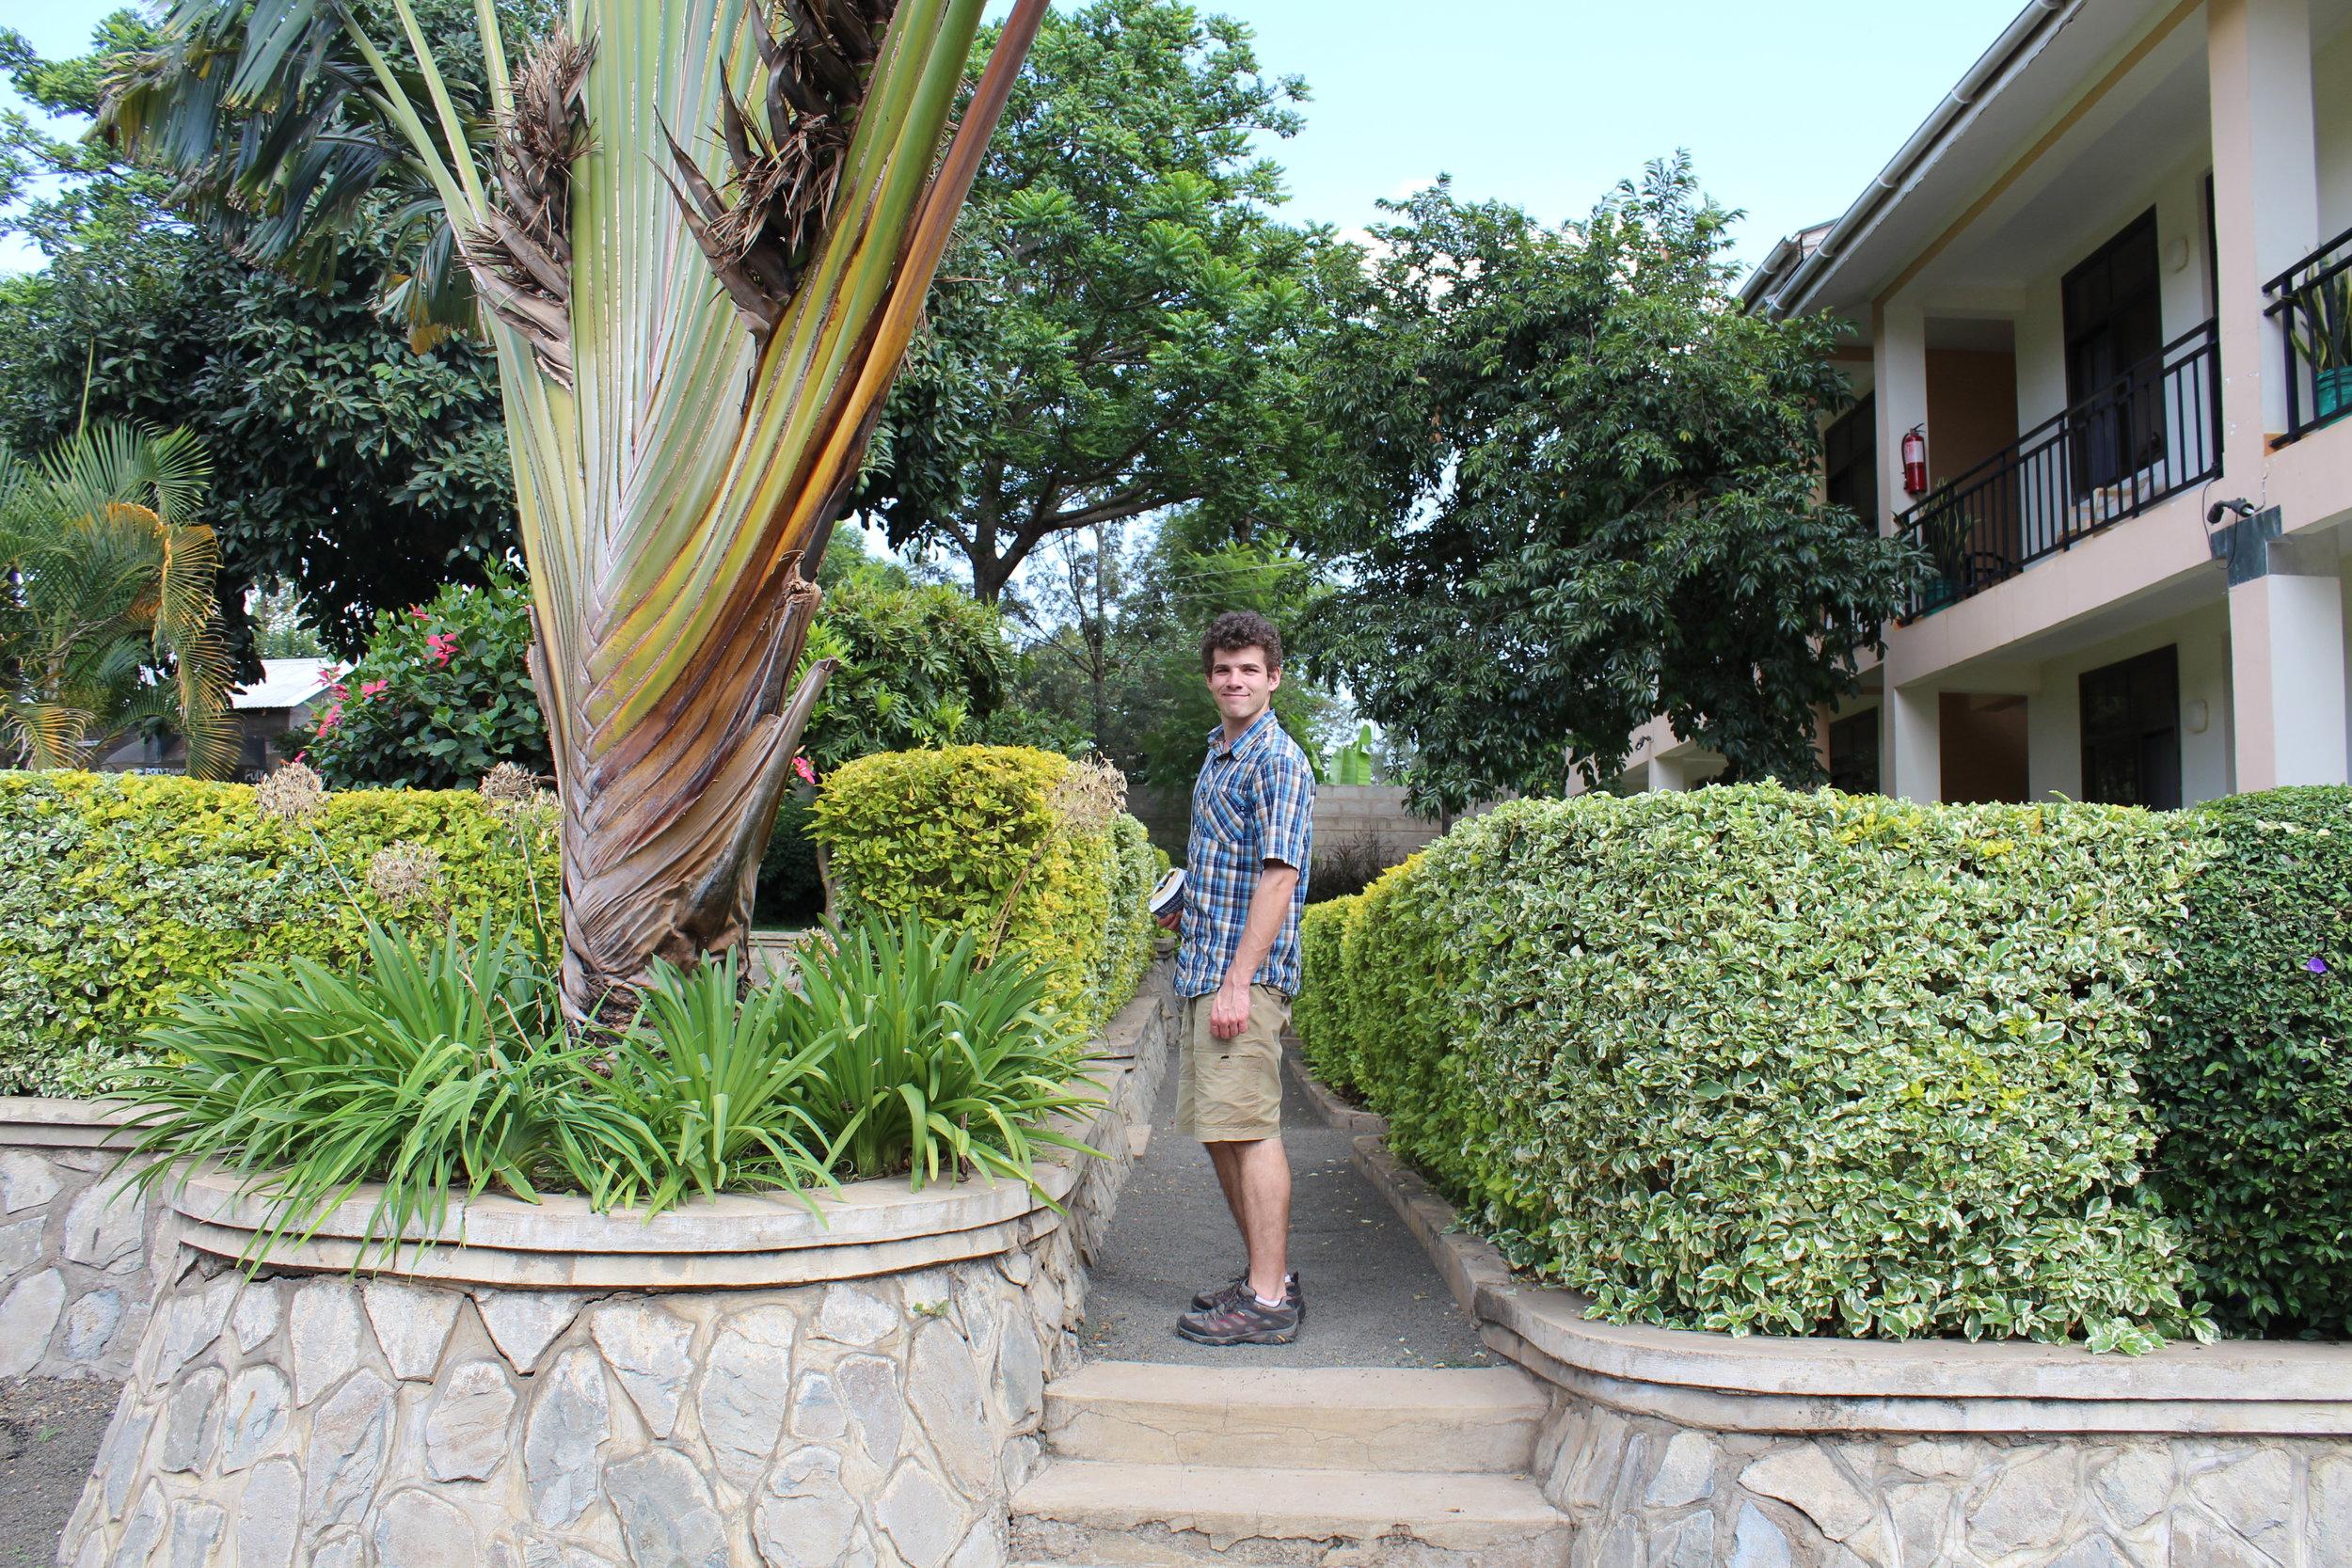 Exploring the grounds of Tumaini Cottage